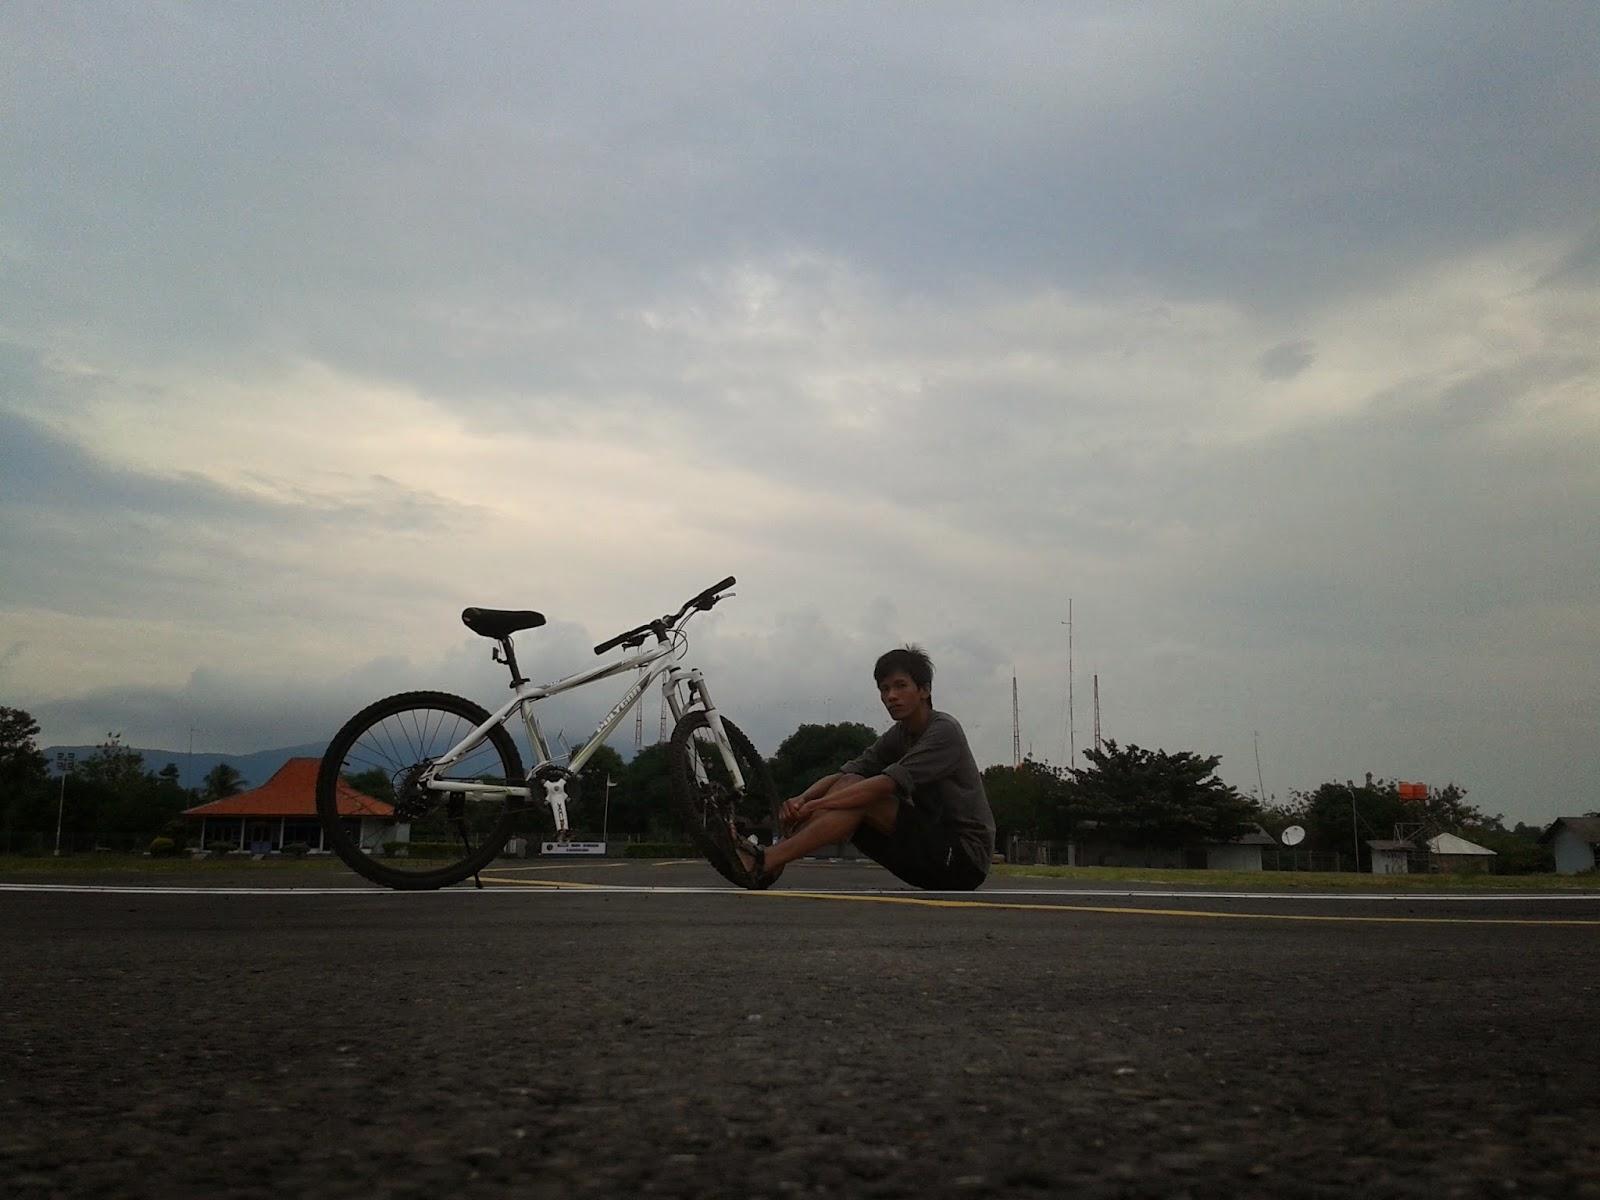 Narsis dulu bareng sepeda disekitaran runway bandara Dewadaru, Karimunjawa